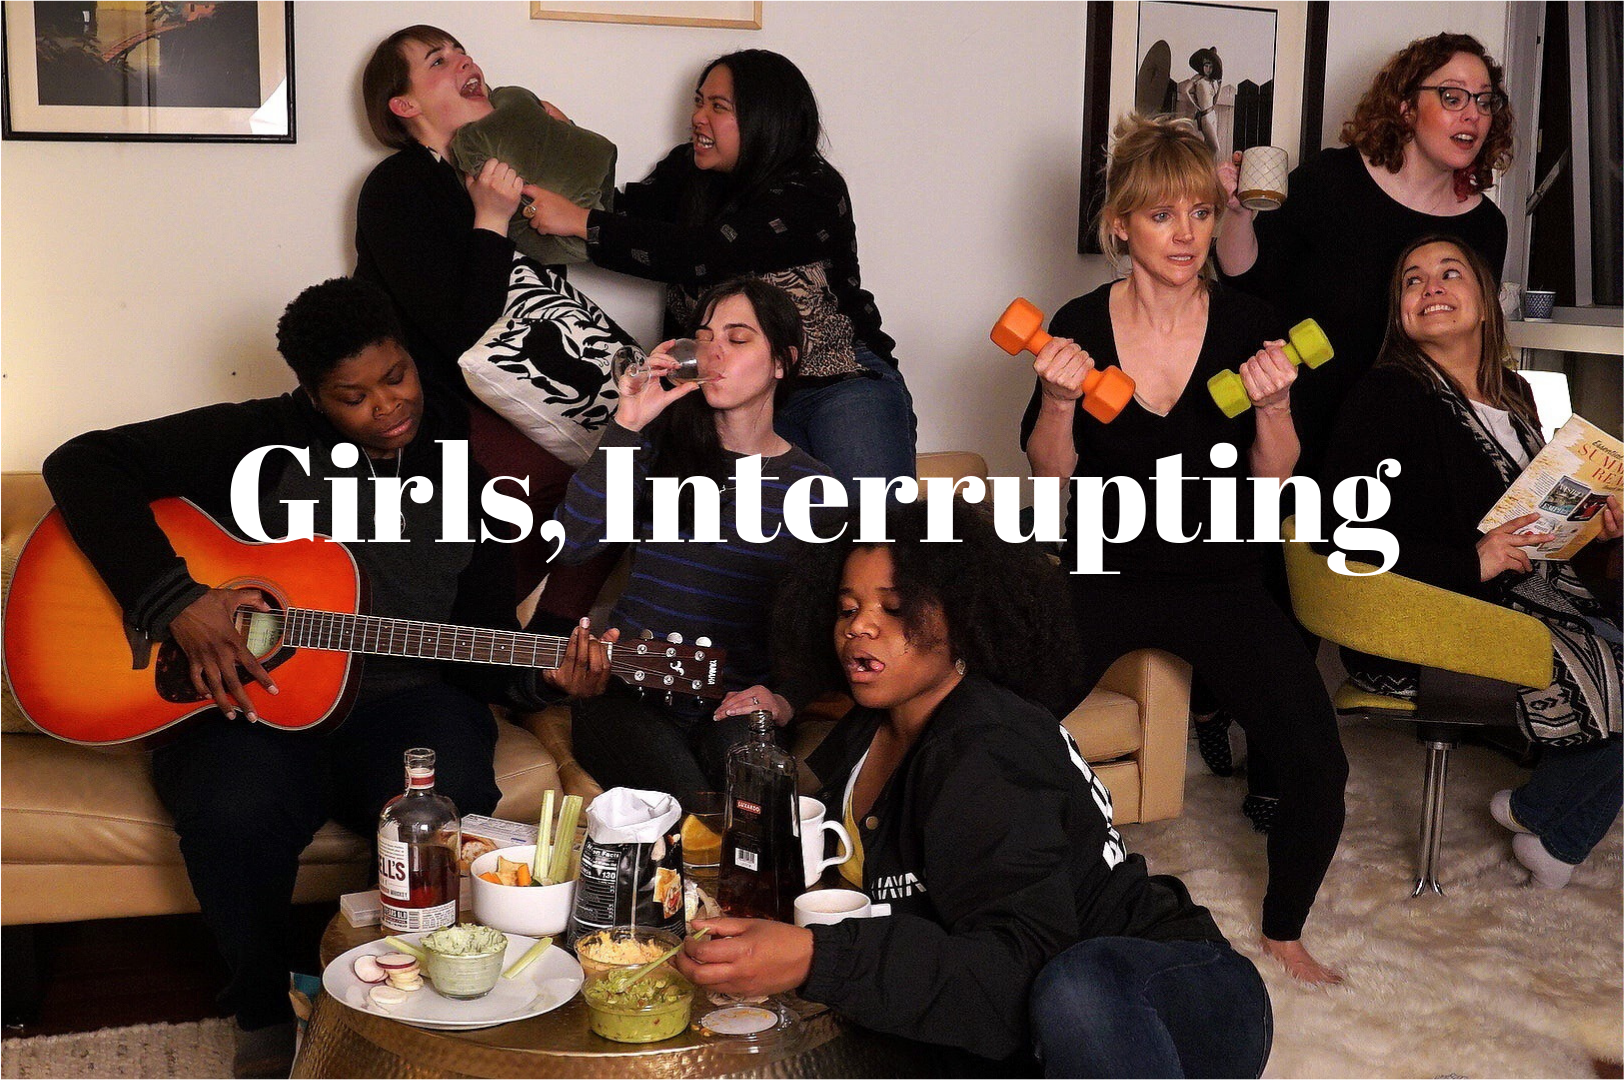 Girls, Interrupting